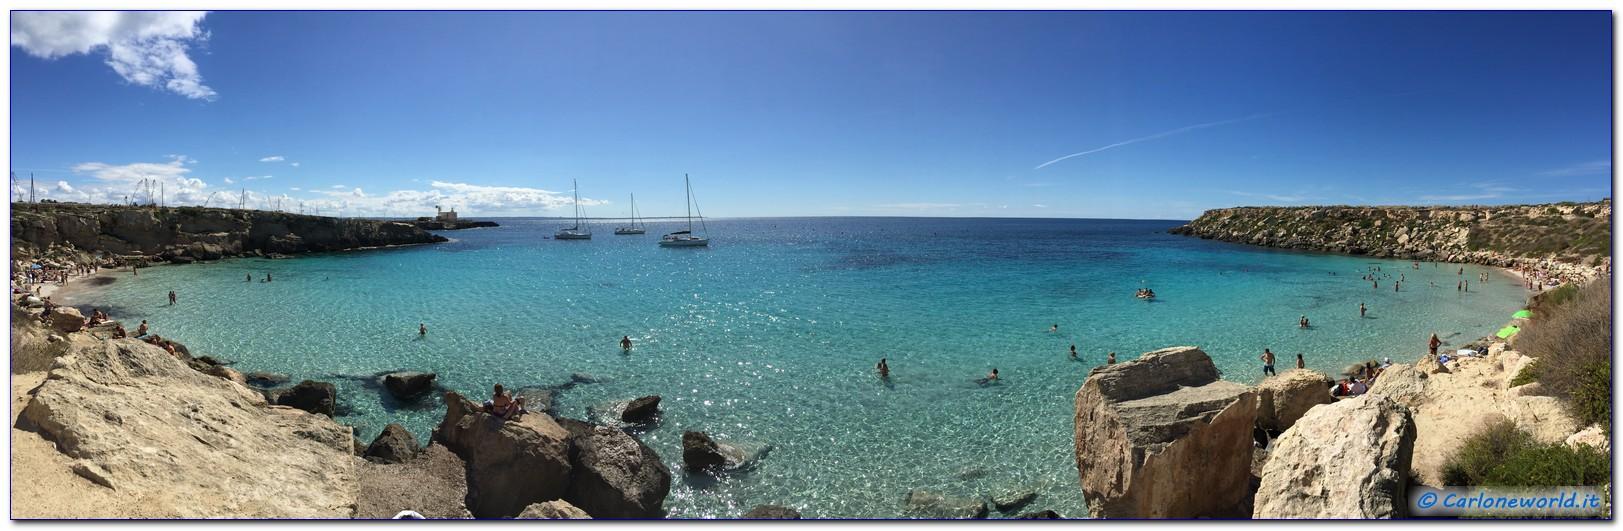 Panoramica Cala Azzurra Favignana